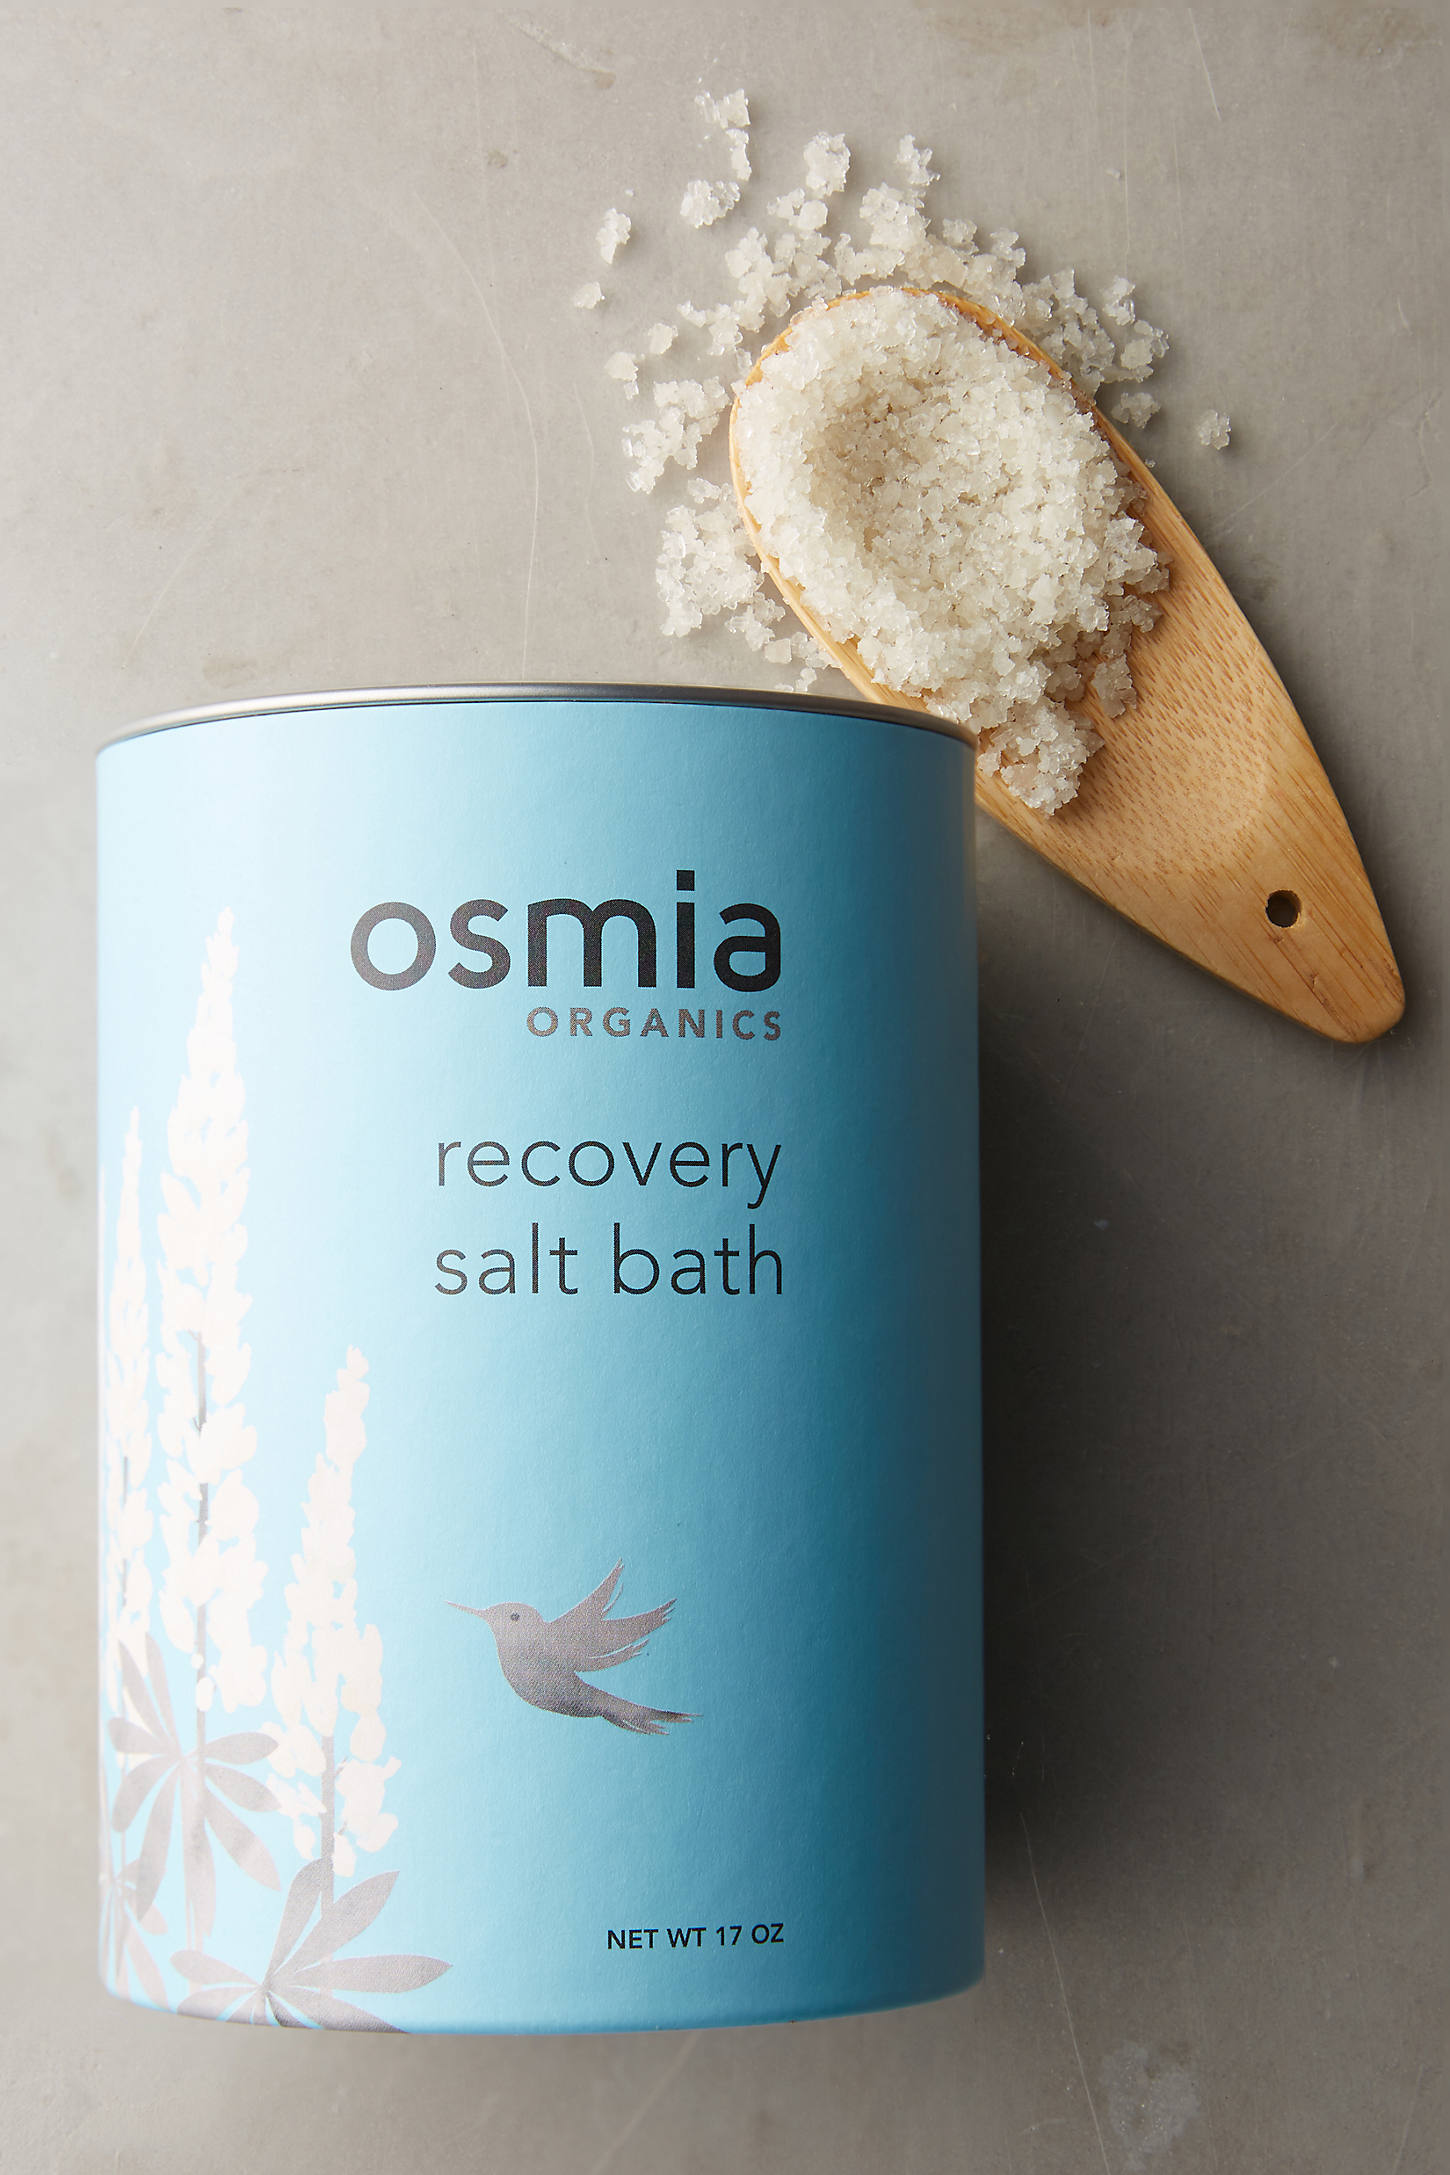 Osmia Organics Recovery Salt Bath